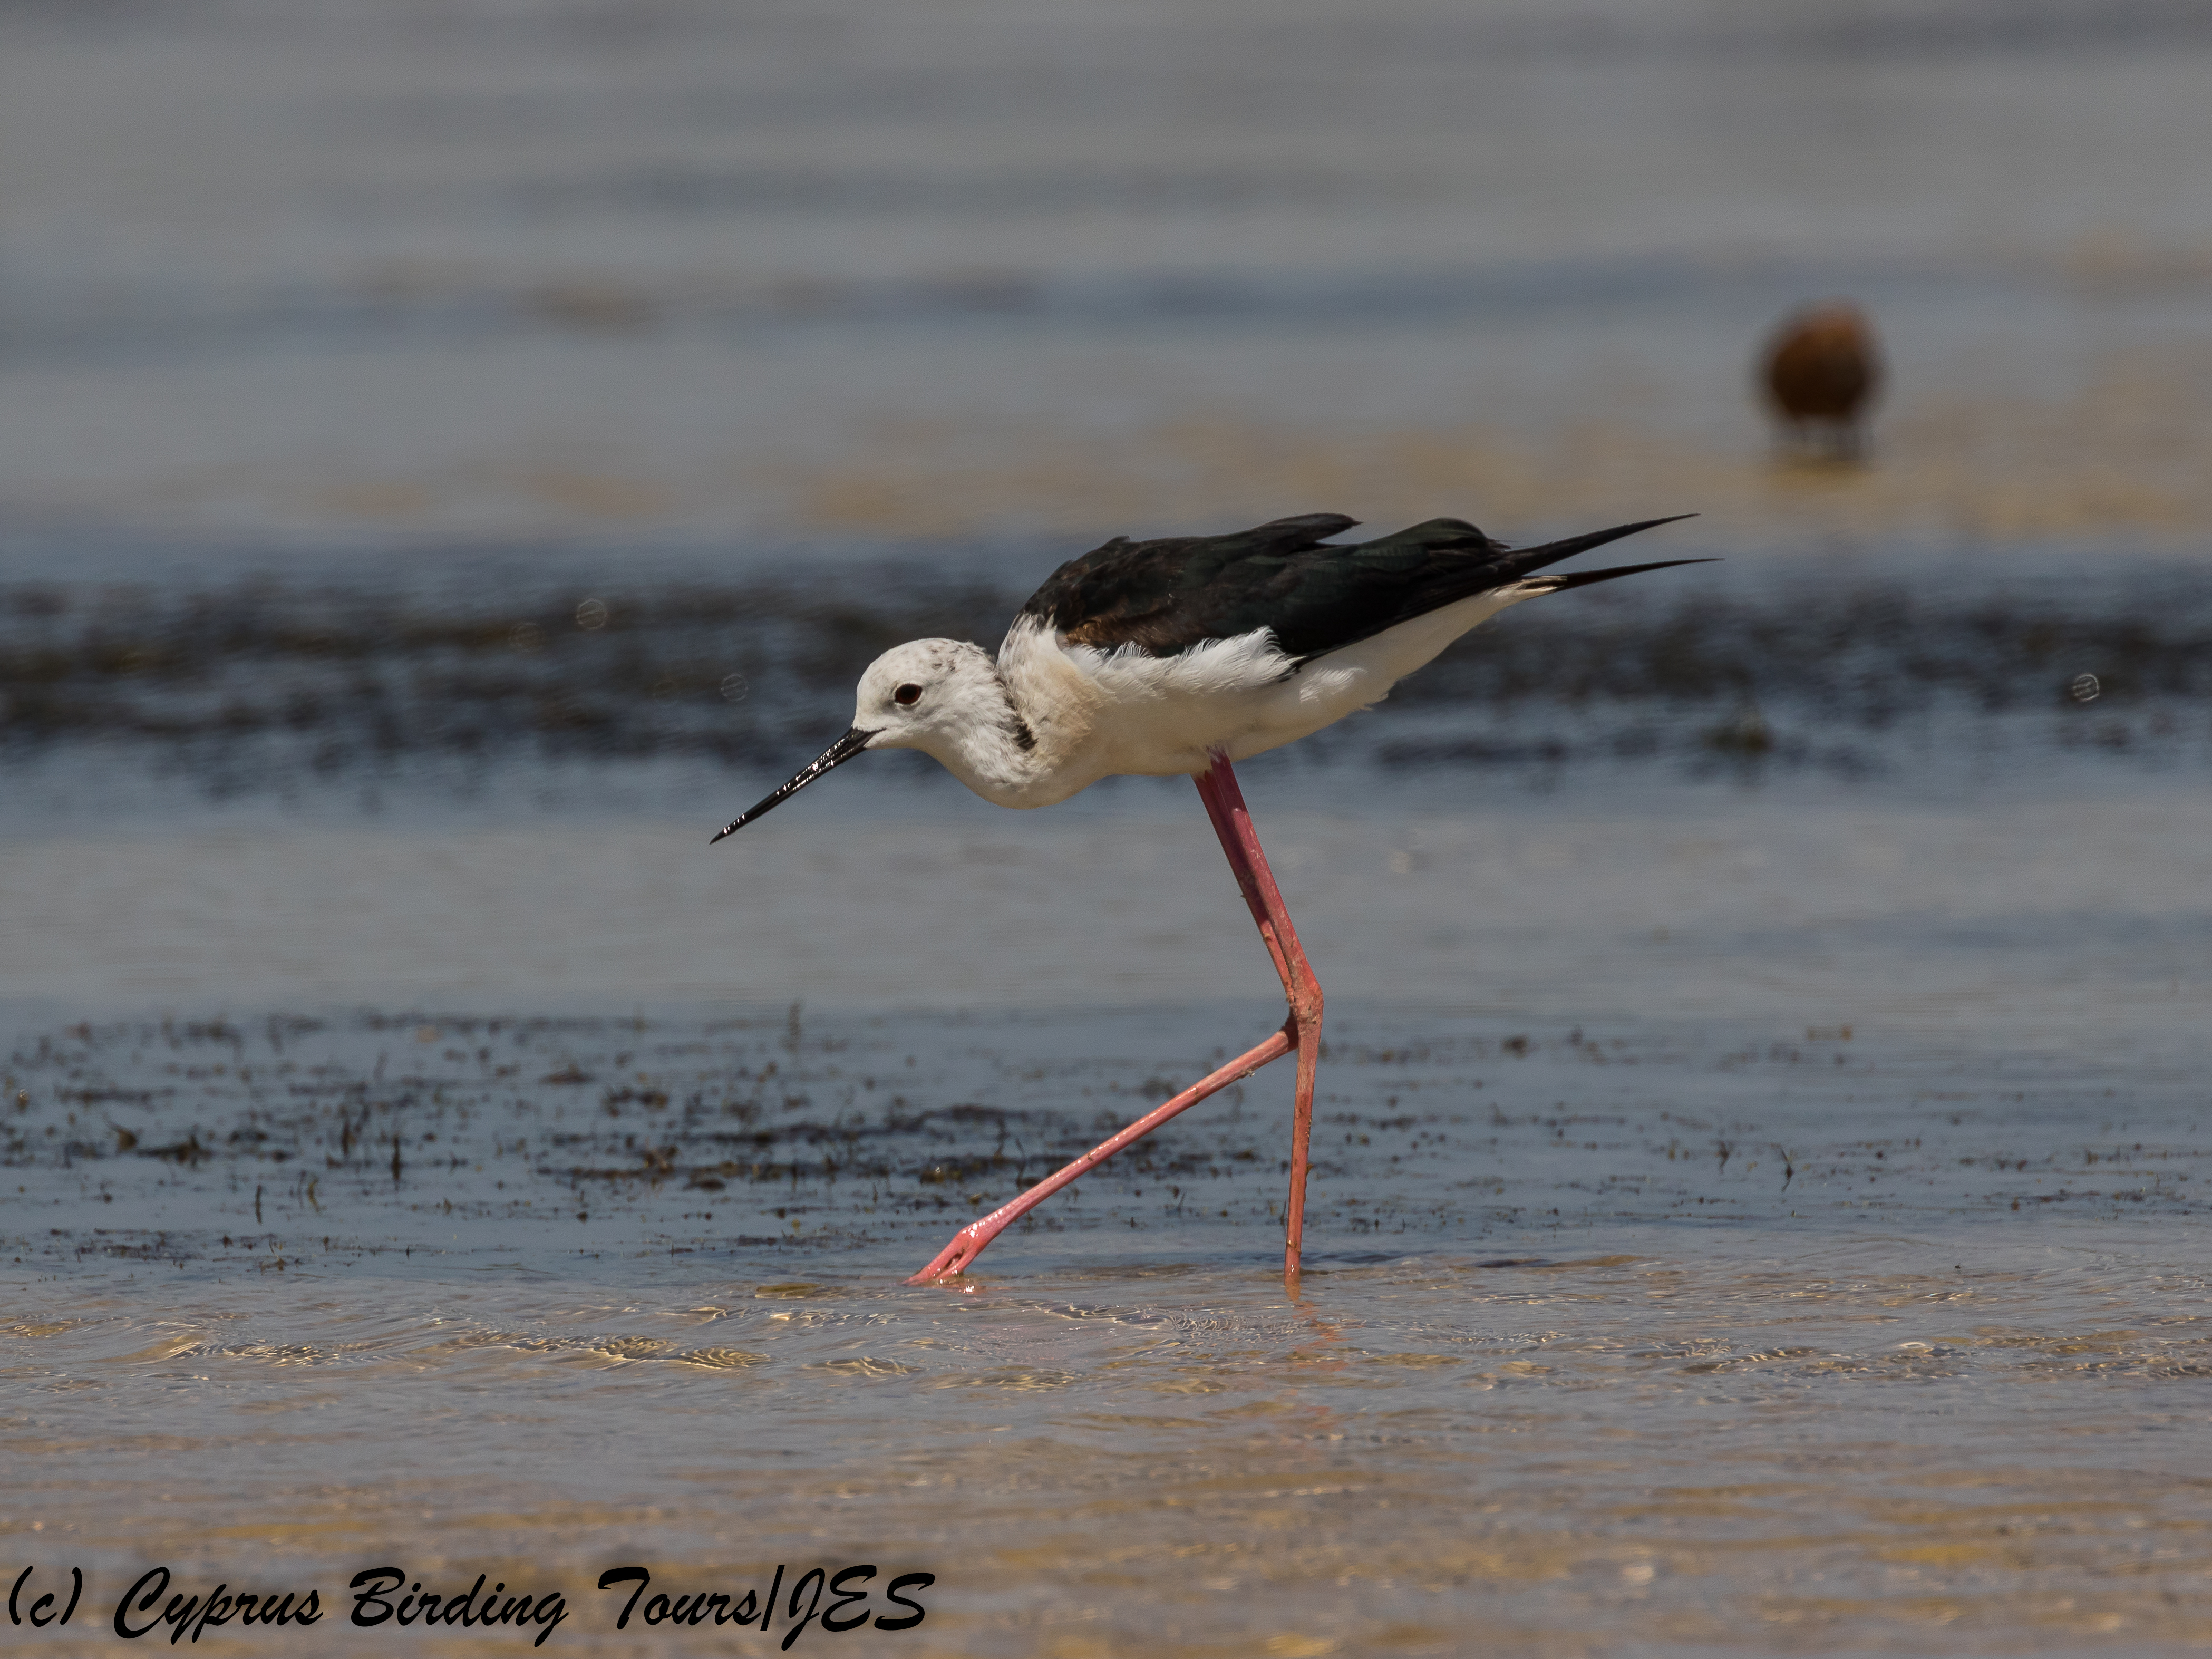 Black-winged Stilt, ASL, 6th July 2018 (c) Cyprus Birding Tours